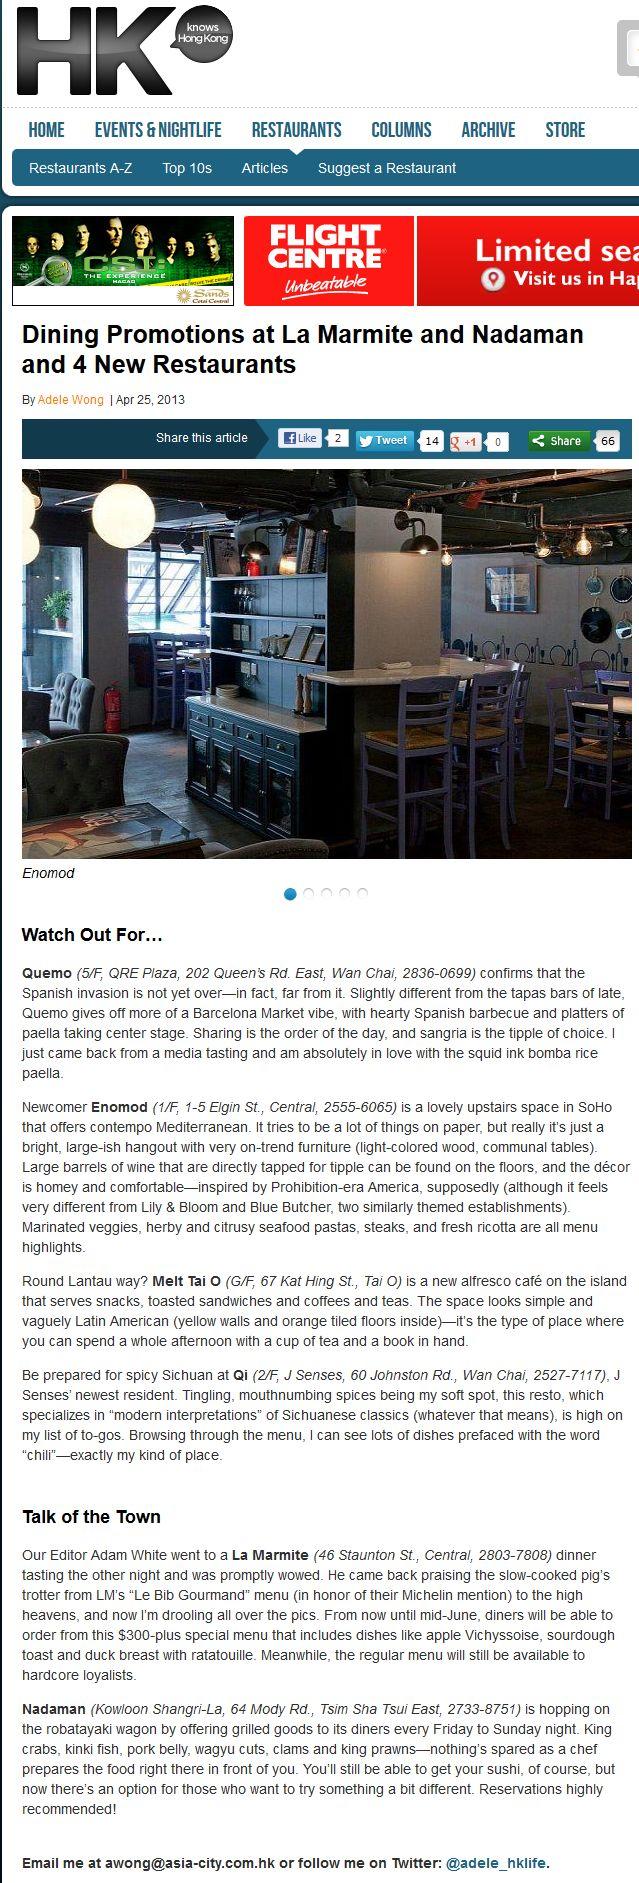 ENOMOD - 25.04 - HK Magazine (online).jpg